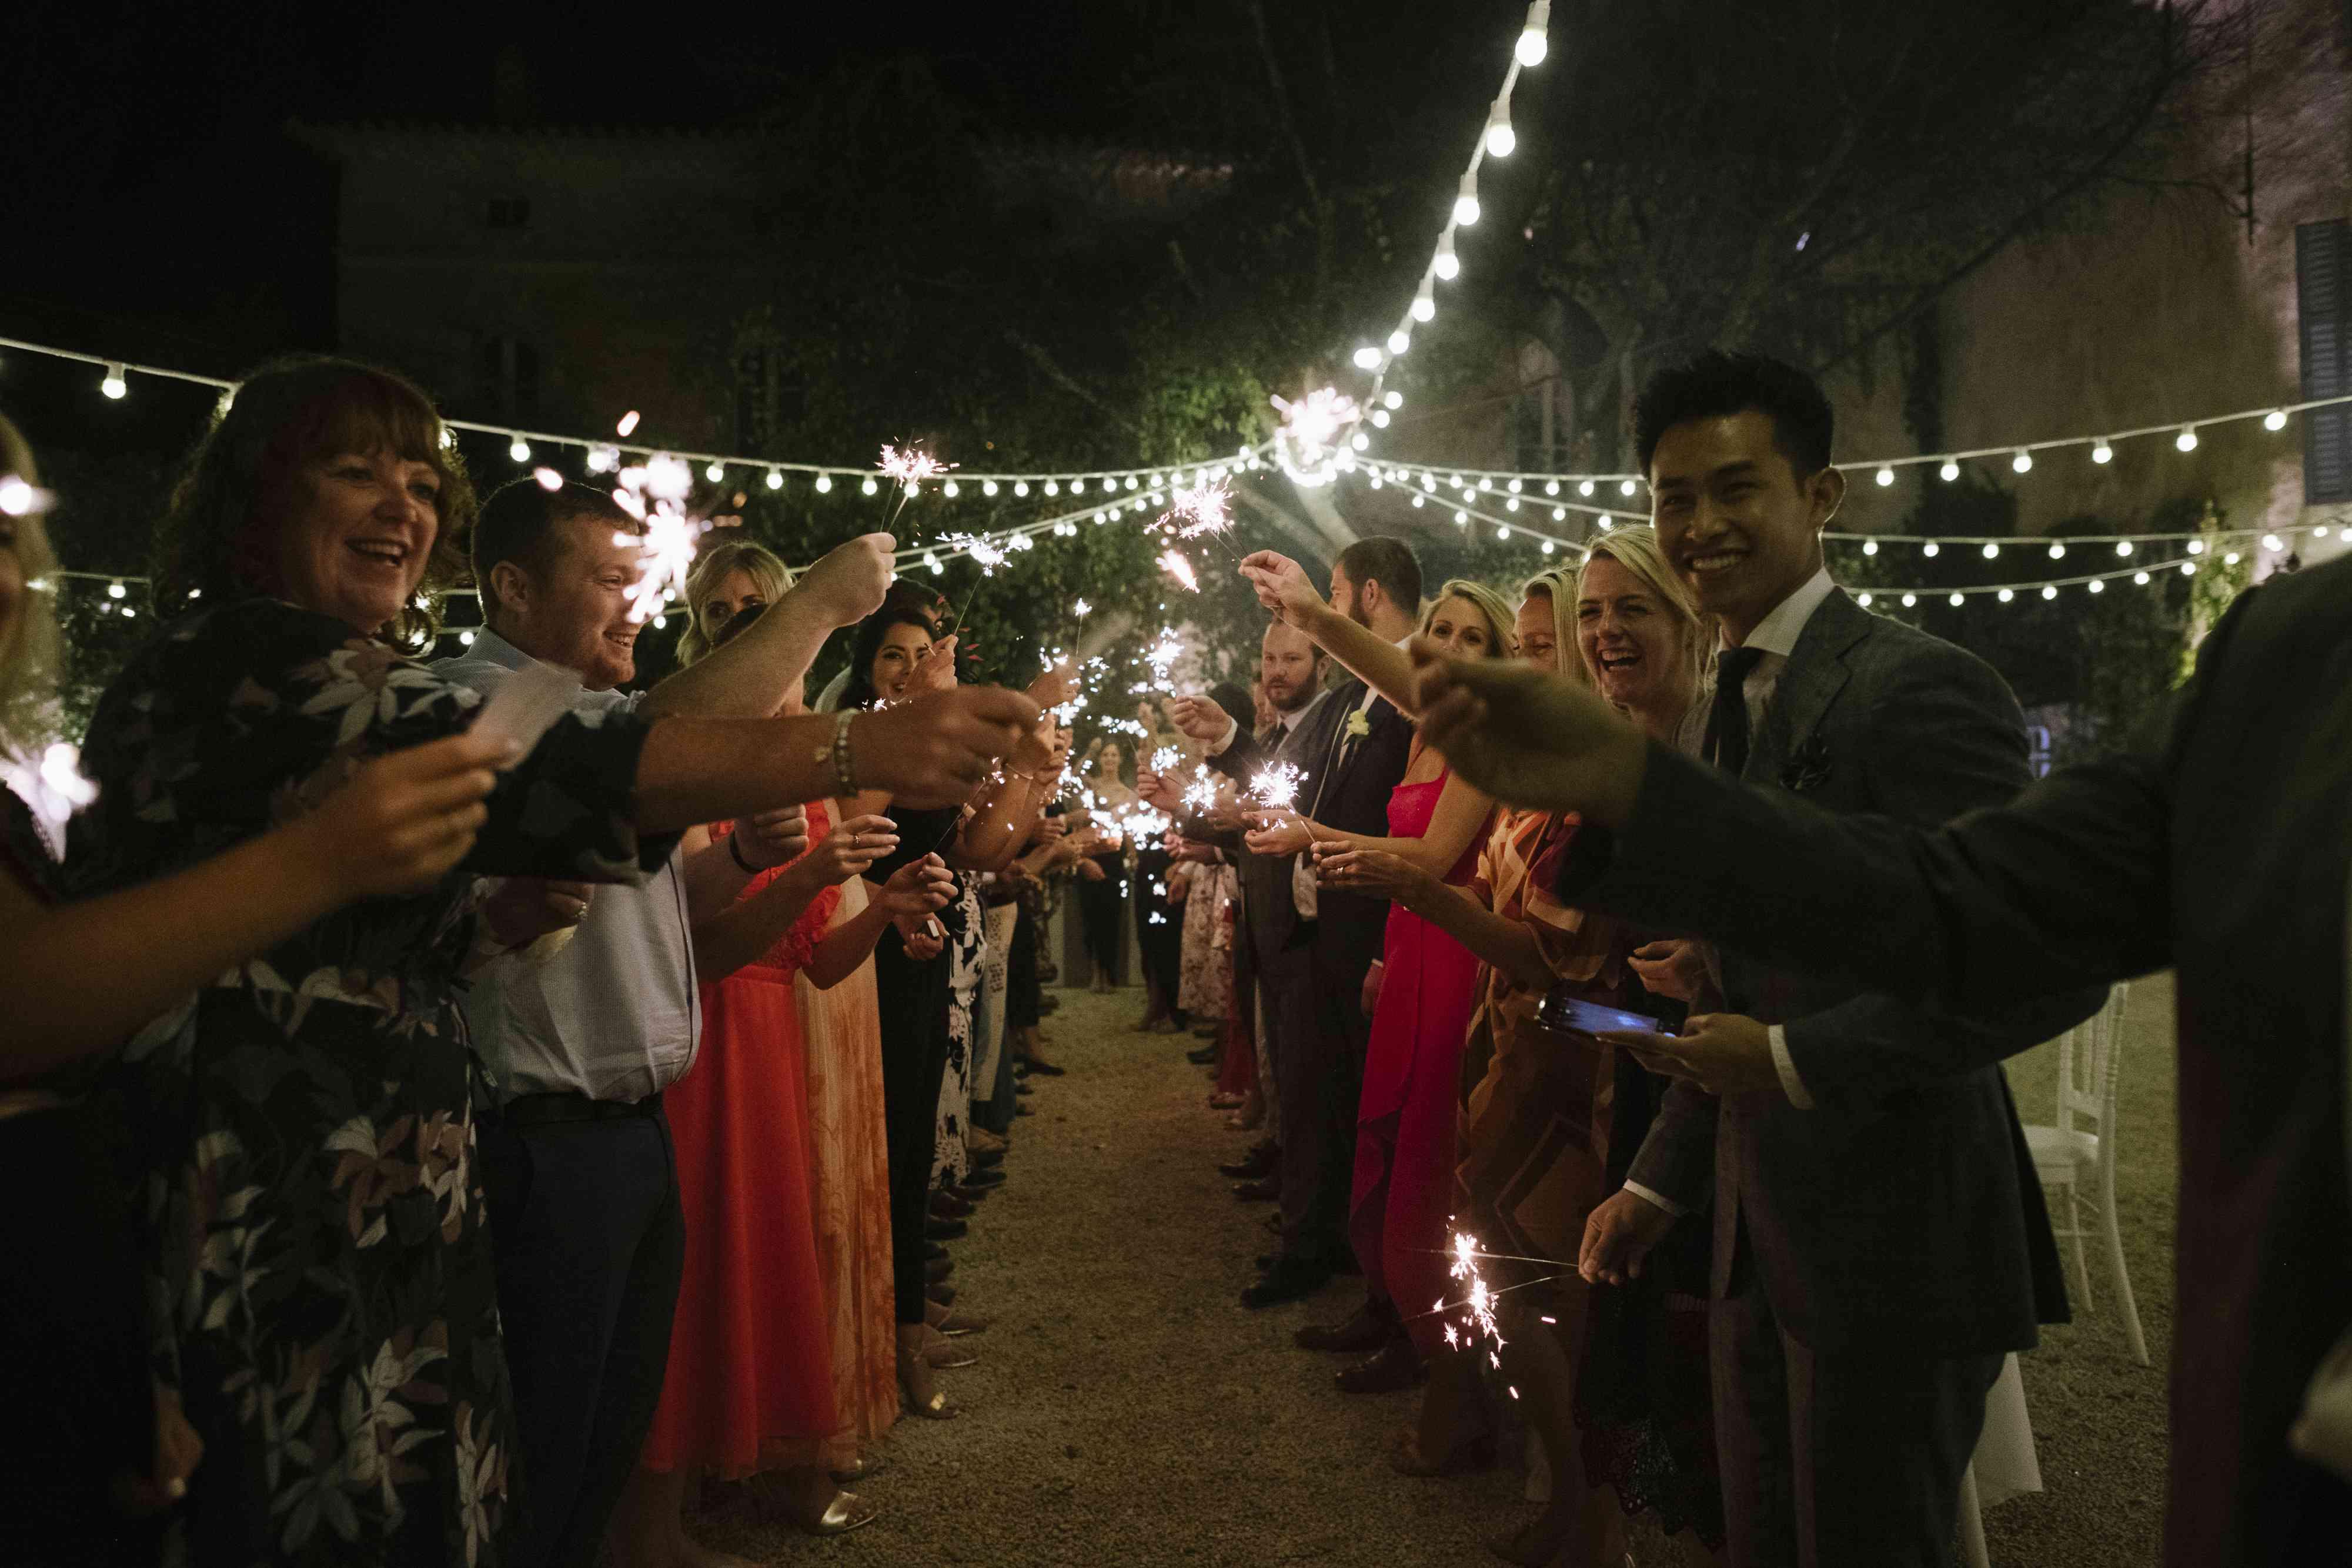 <p>wedding guest sparklers</p><br><br>